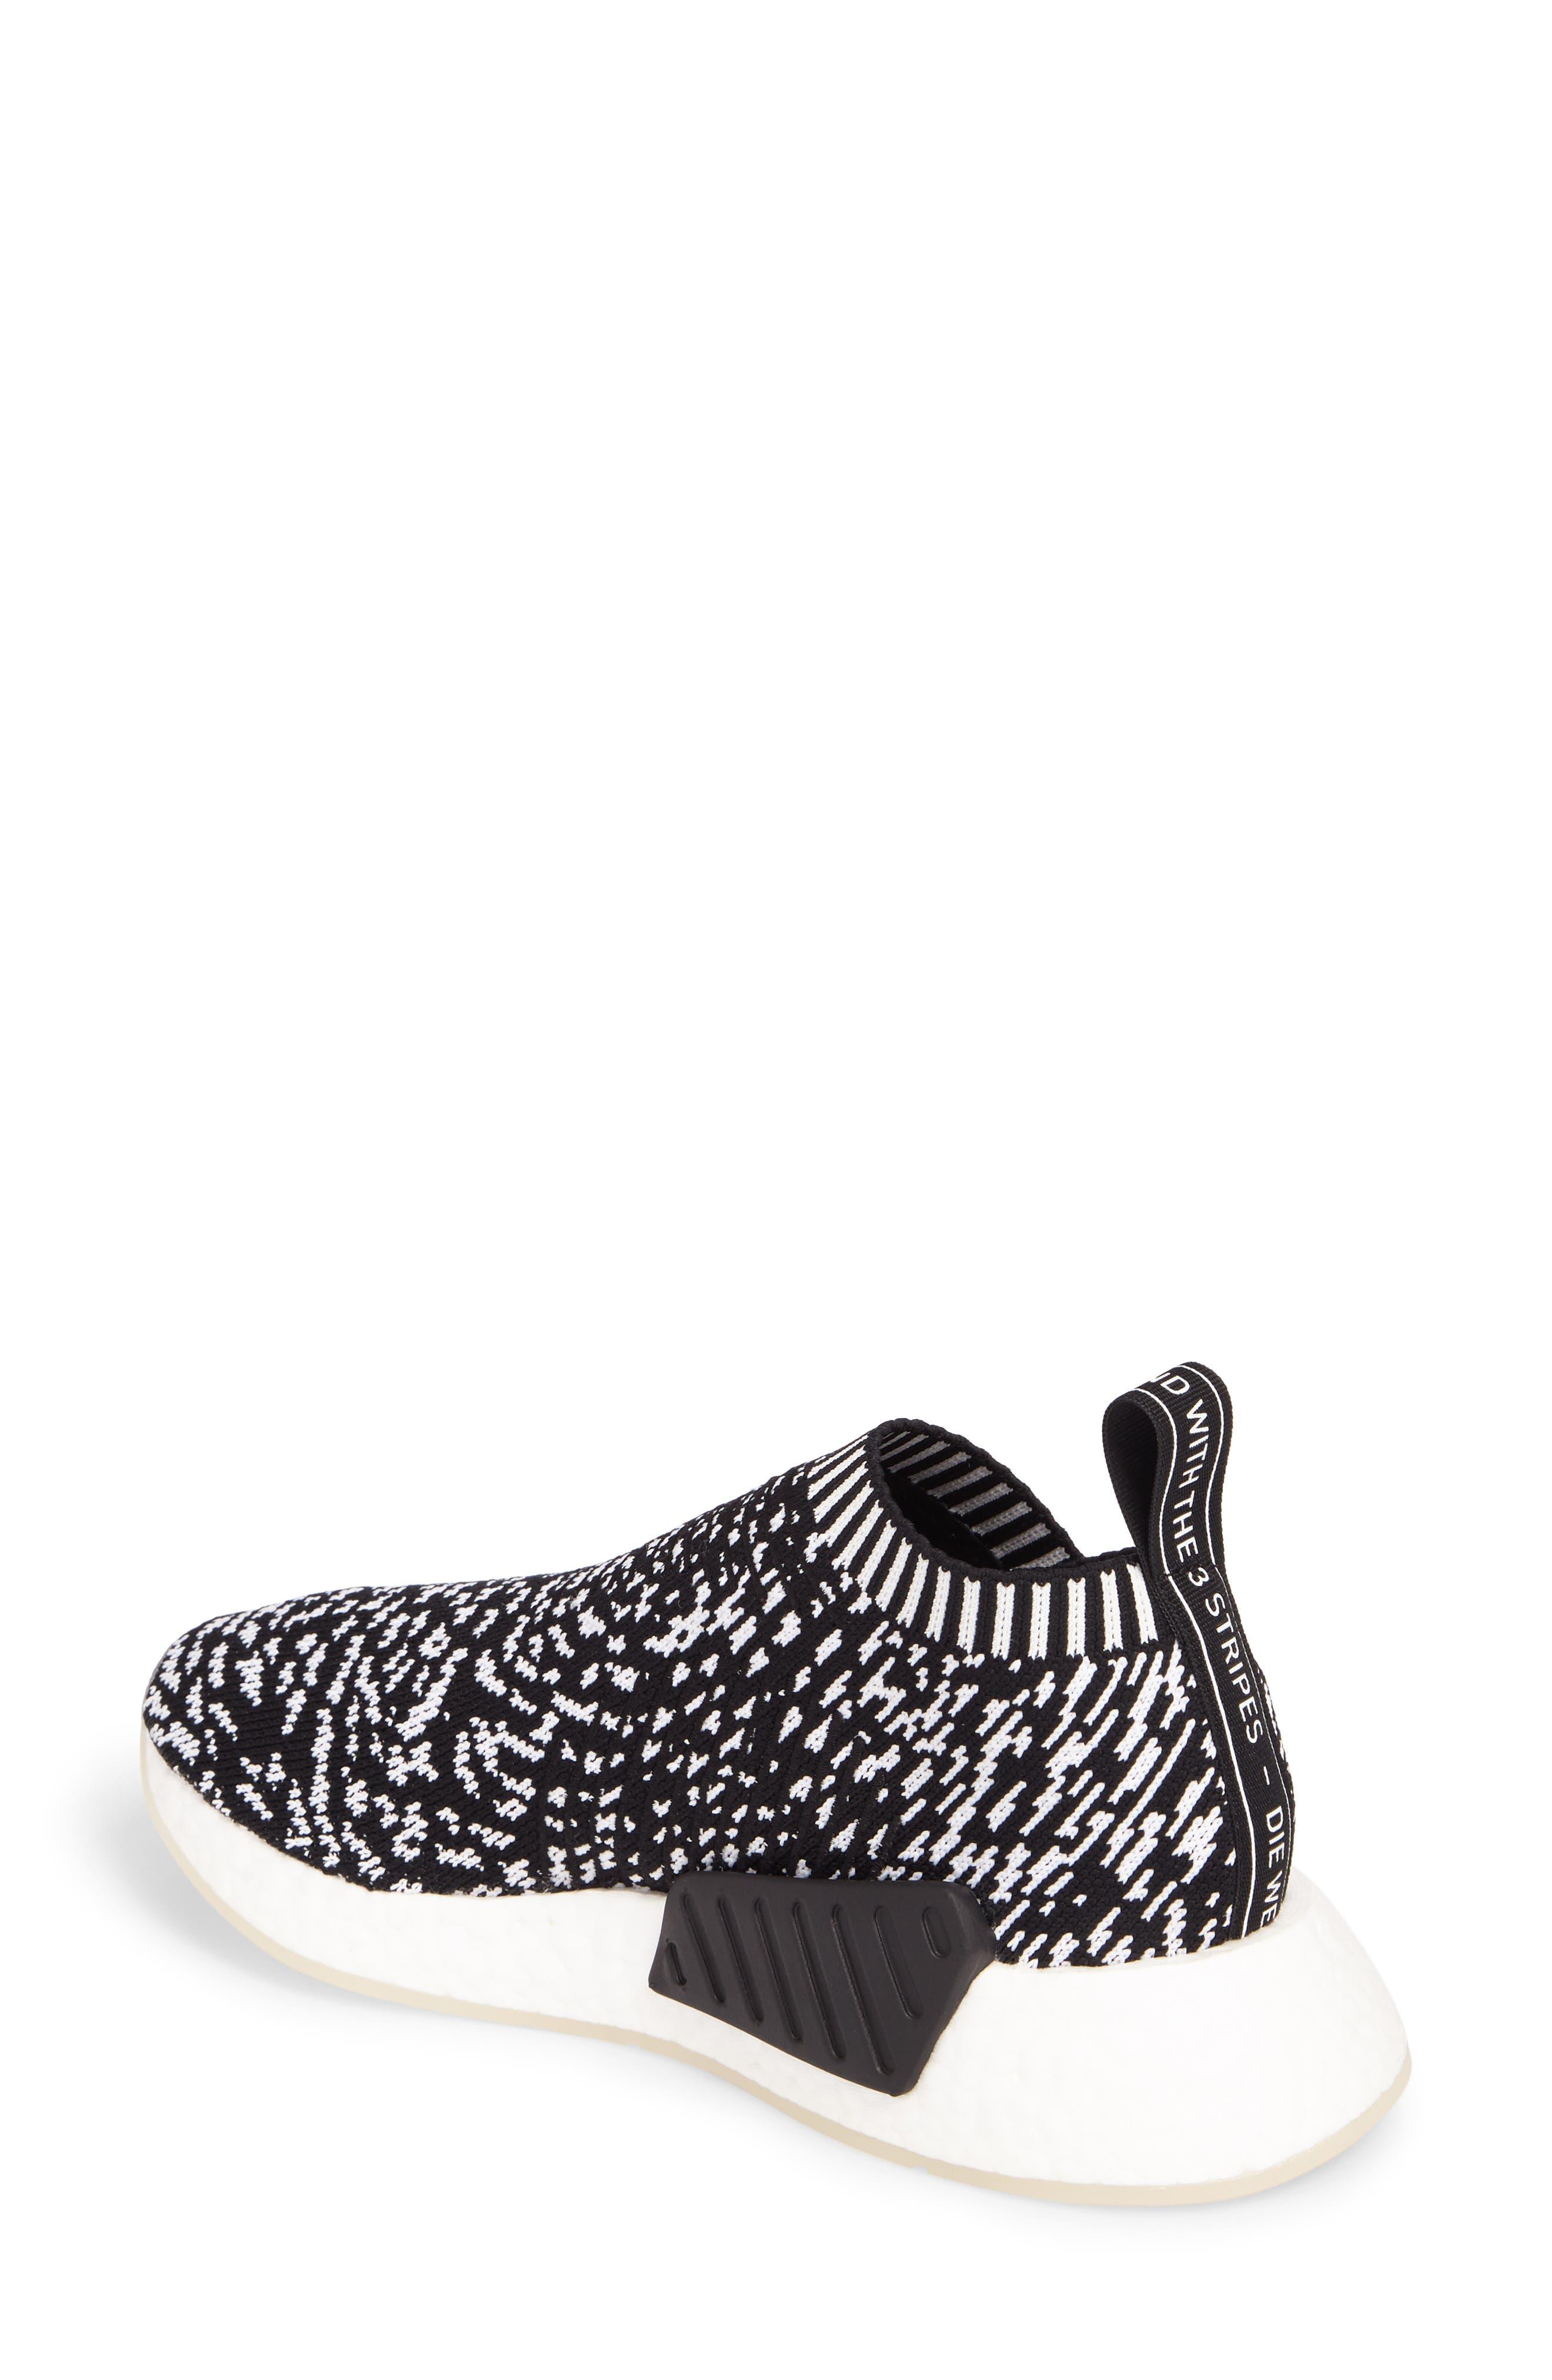 NMD_CS2 Primeknit Sneaker,                             Alternate thumbnail 2, color,                             001